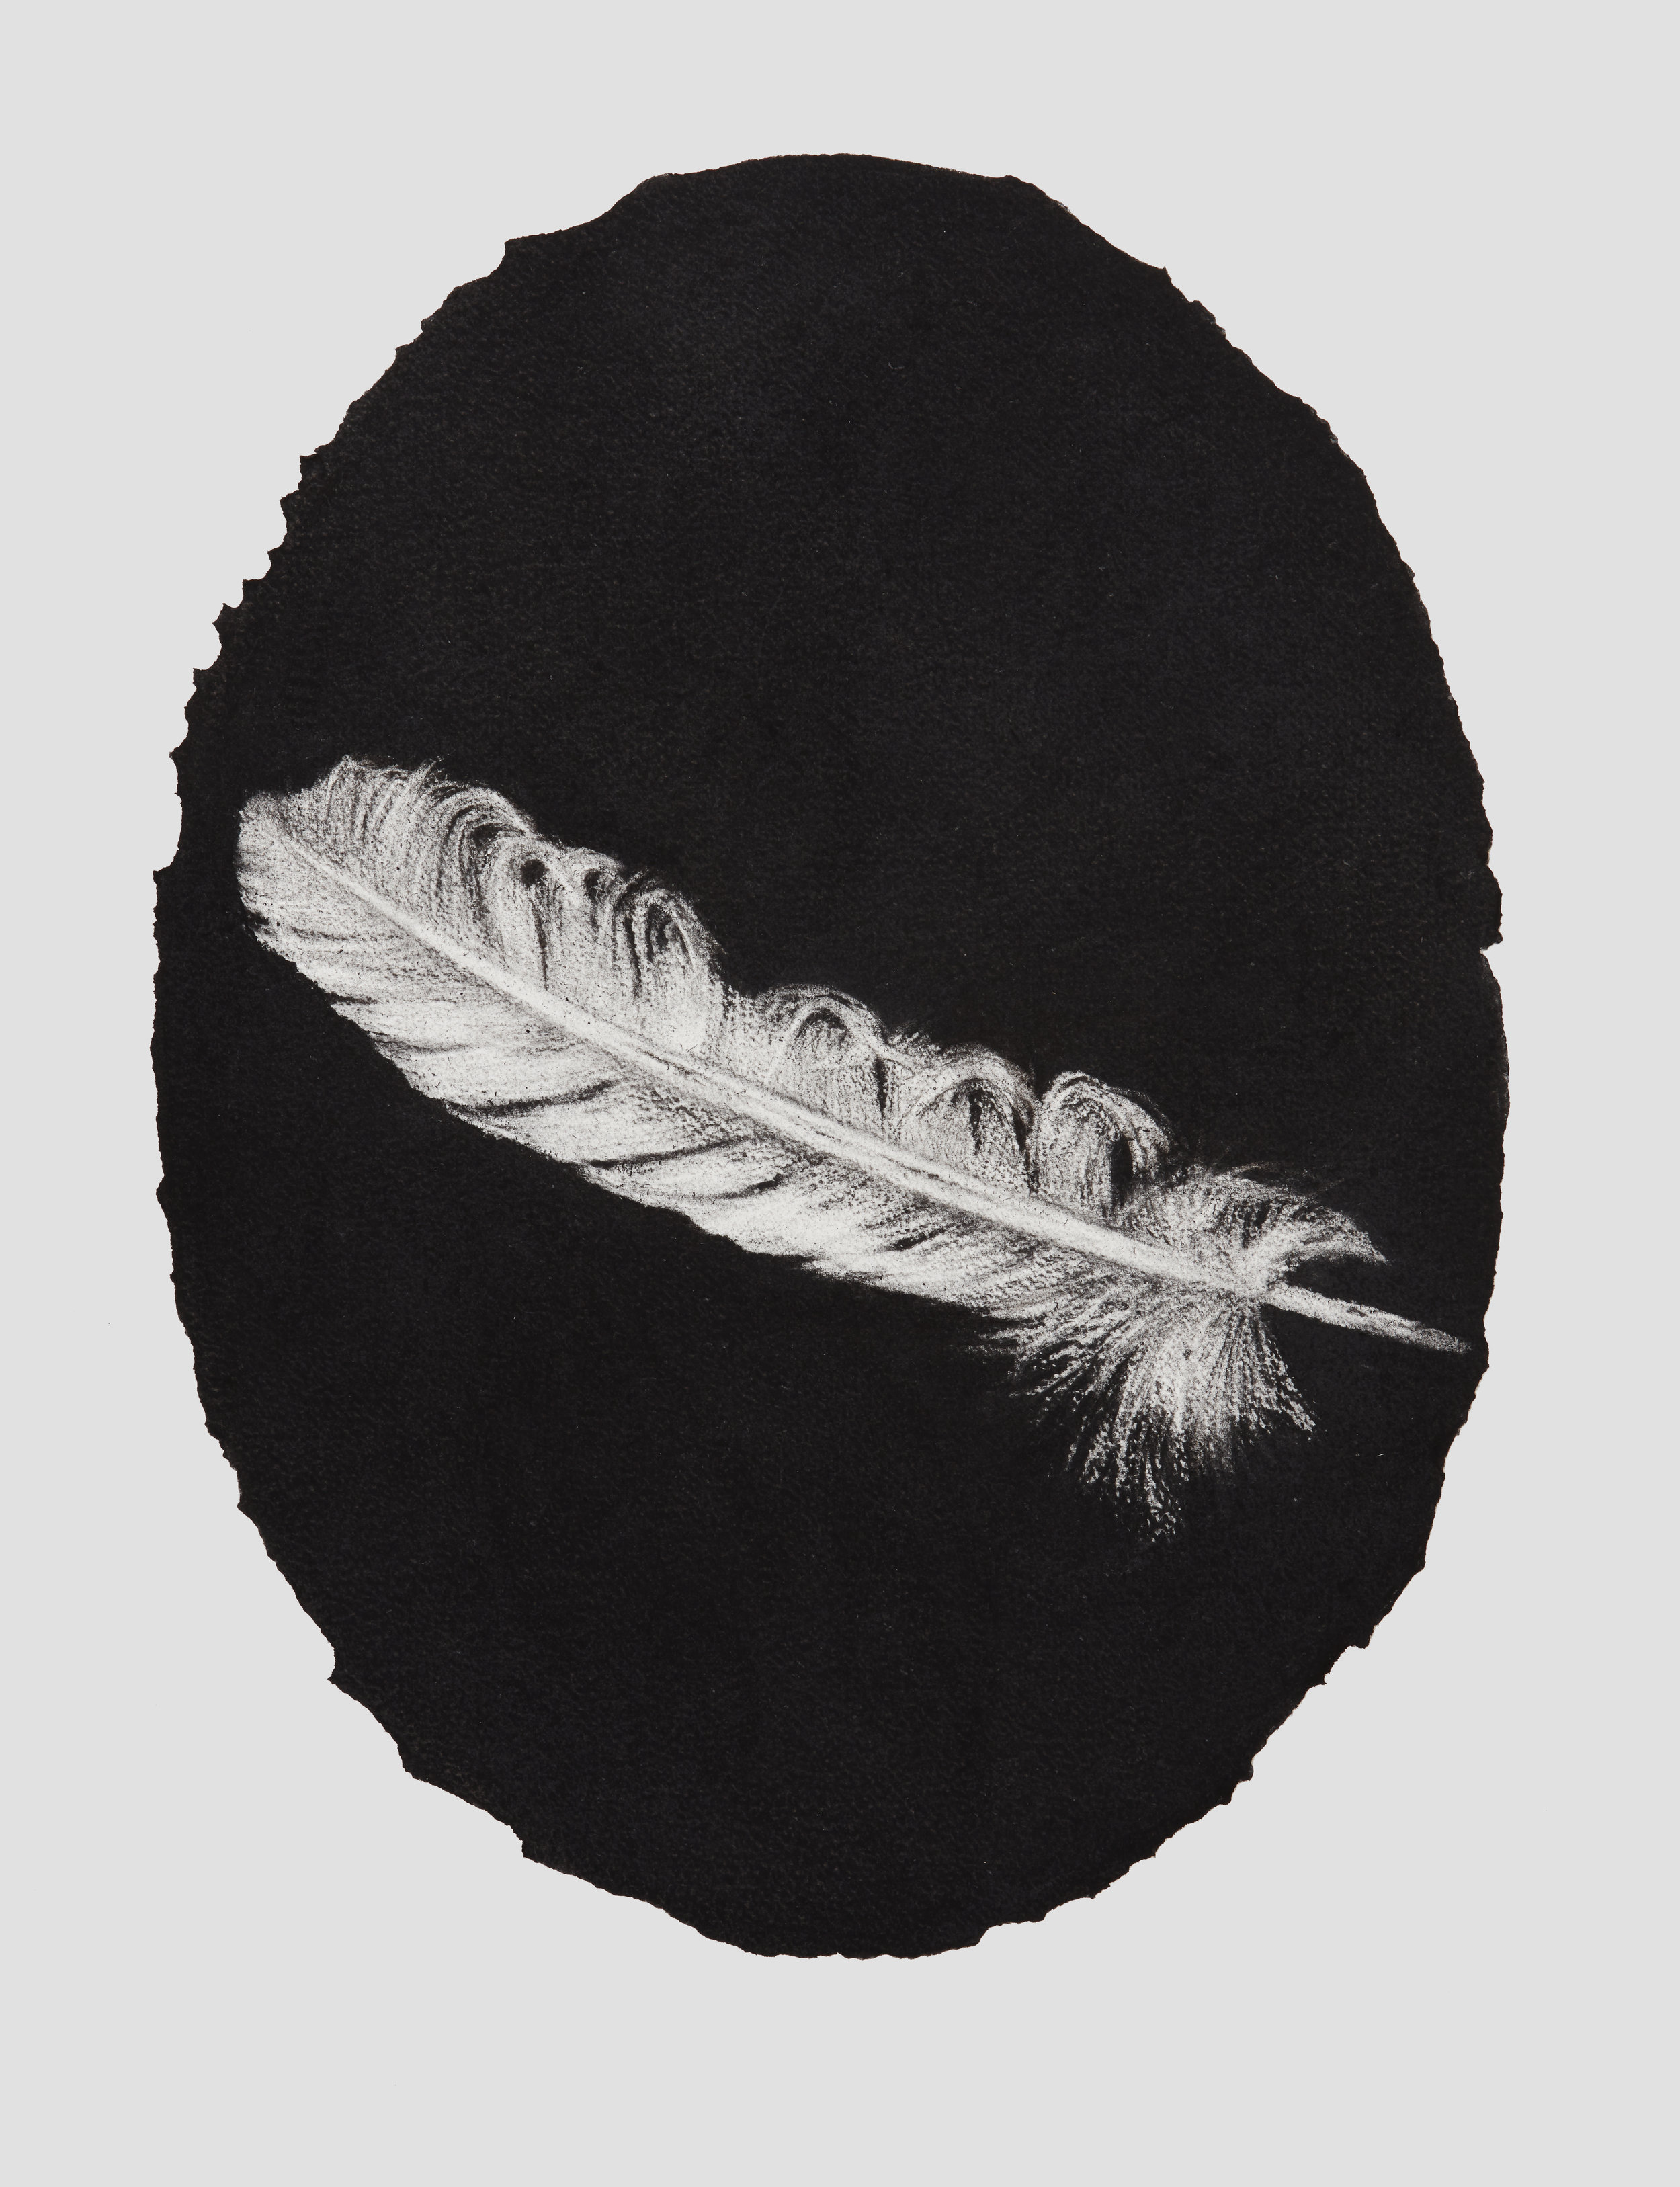 portrait feather, 2017, 44x33cm, charcoal on paper